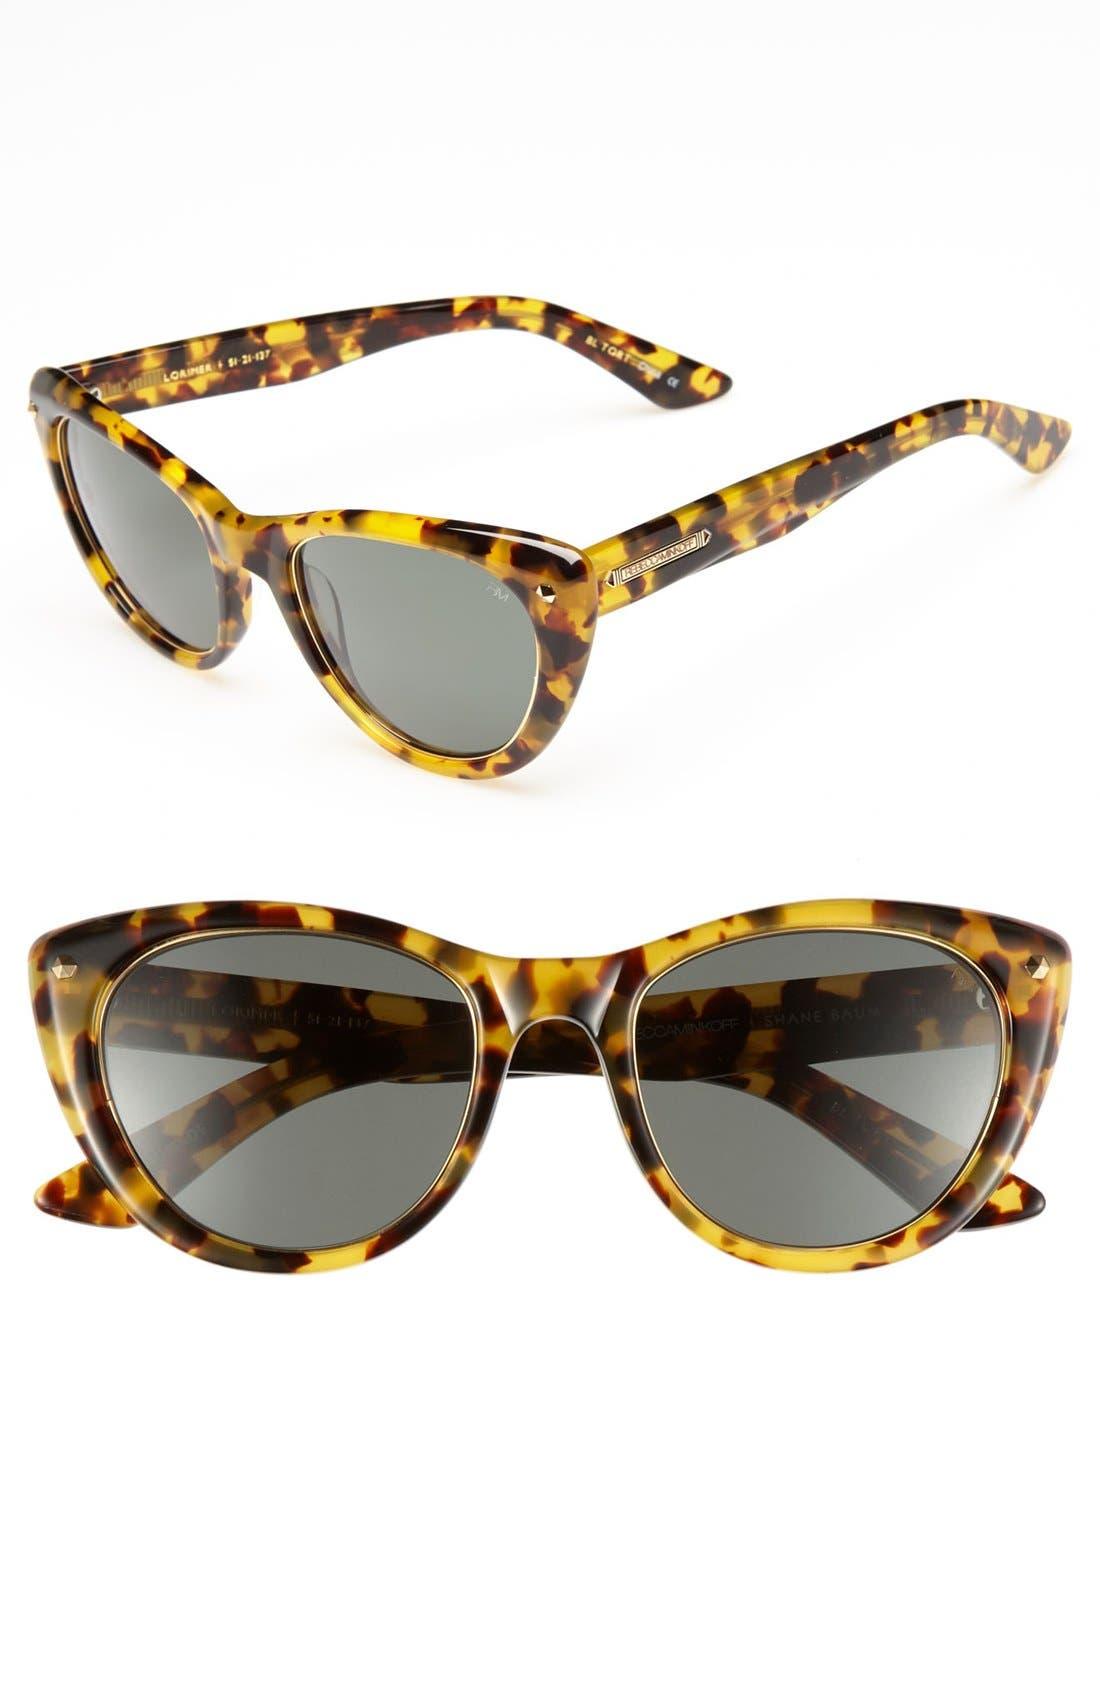 Alternate Image 1 Selected - Rebecca Minkoff 'Lorimer' Sunglasses